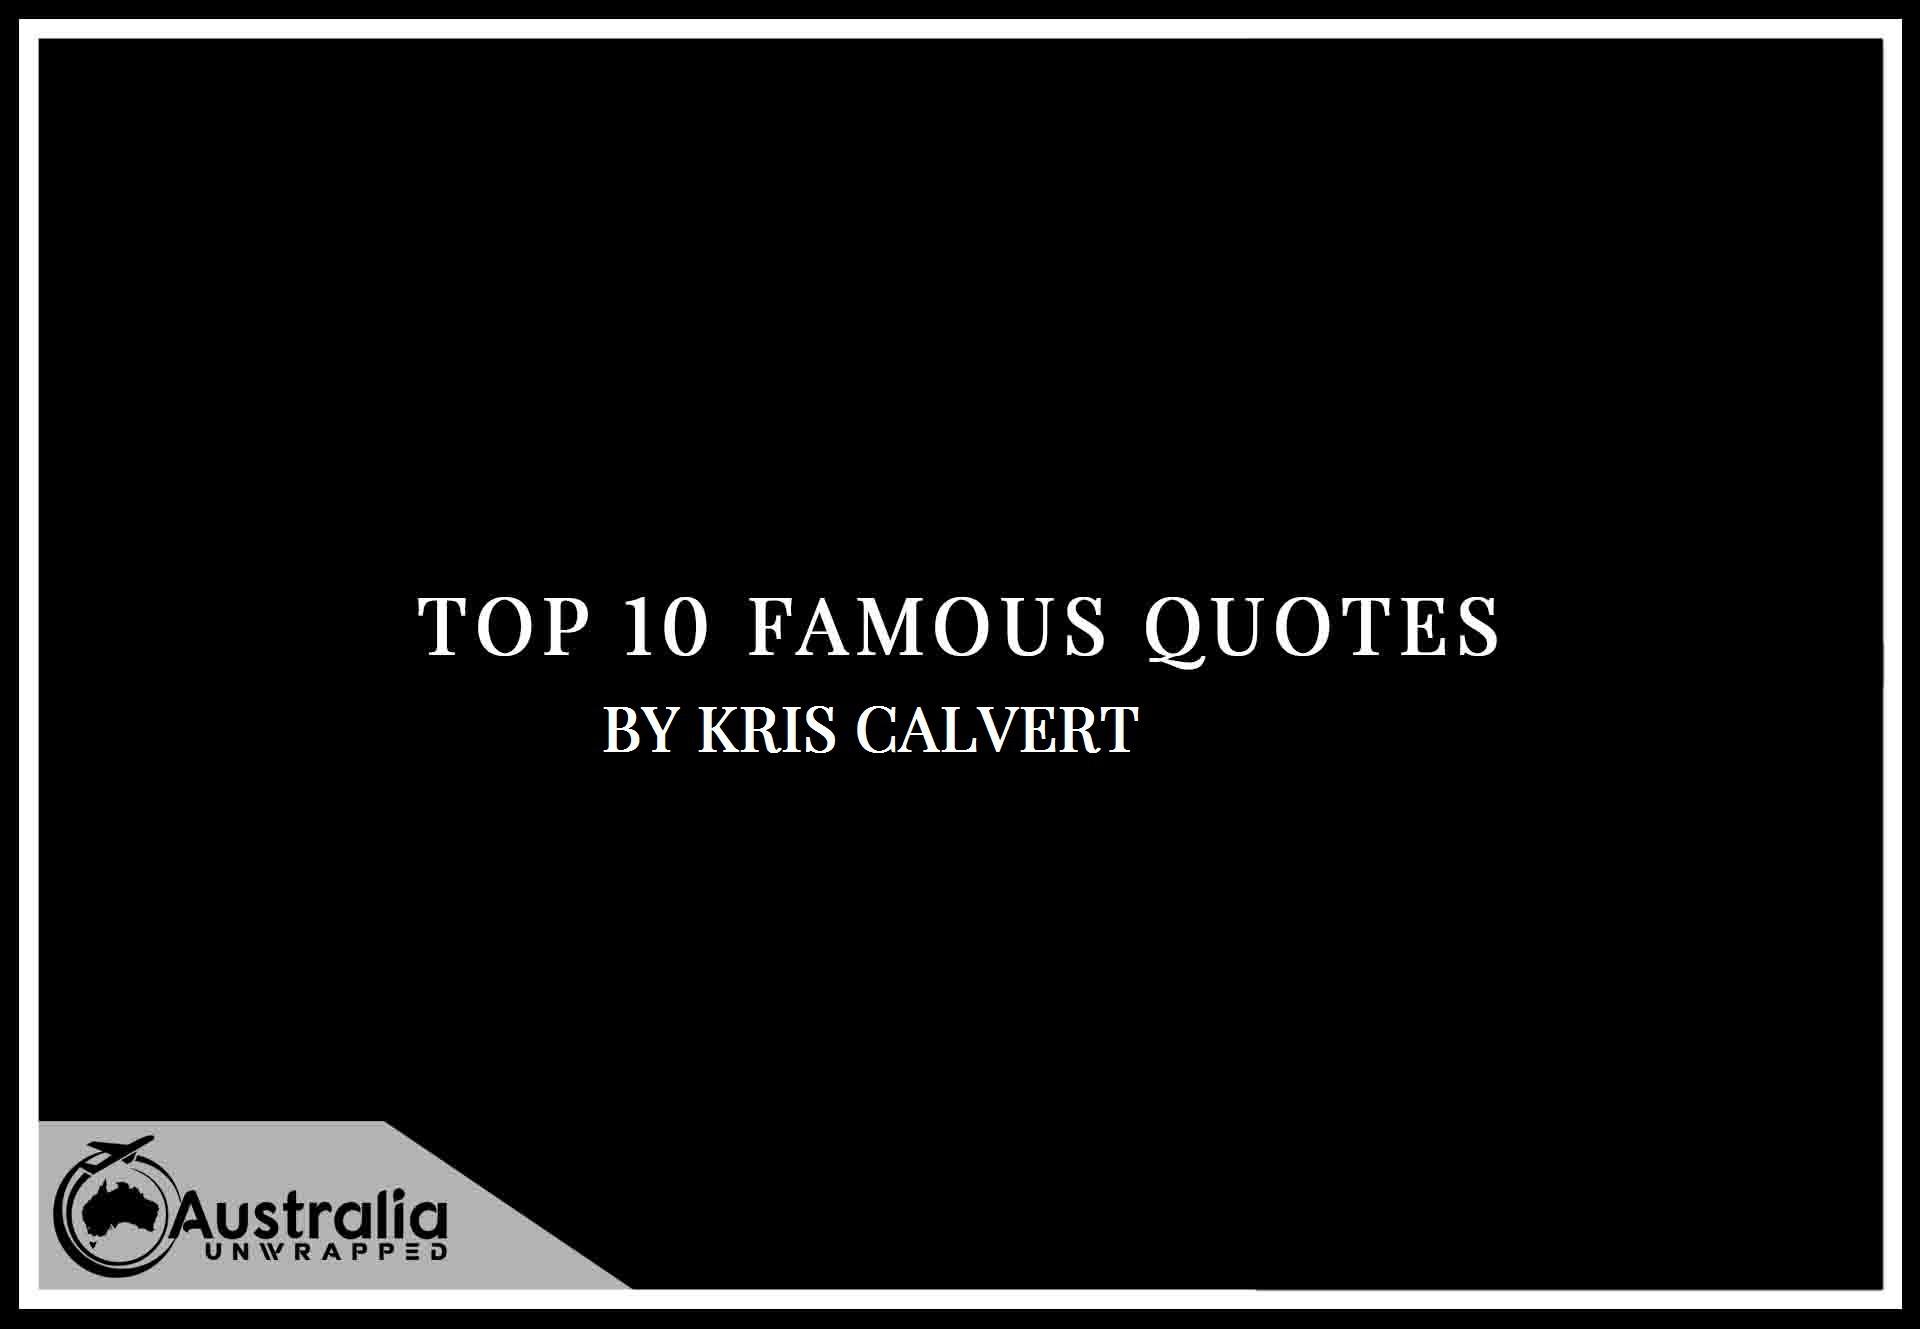 Kris Calvert's Top 10 Popular and Famous Quotes